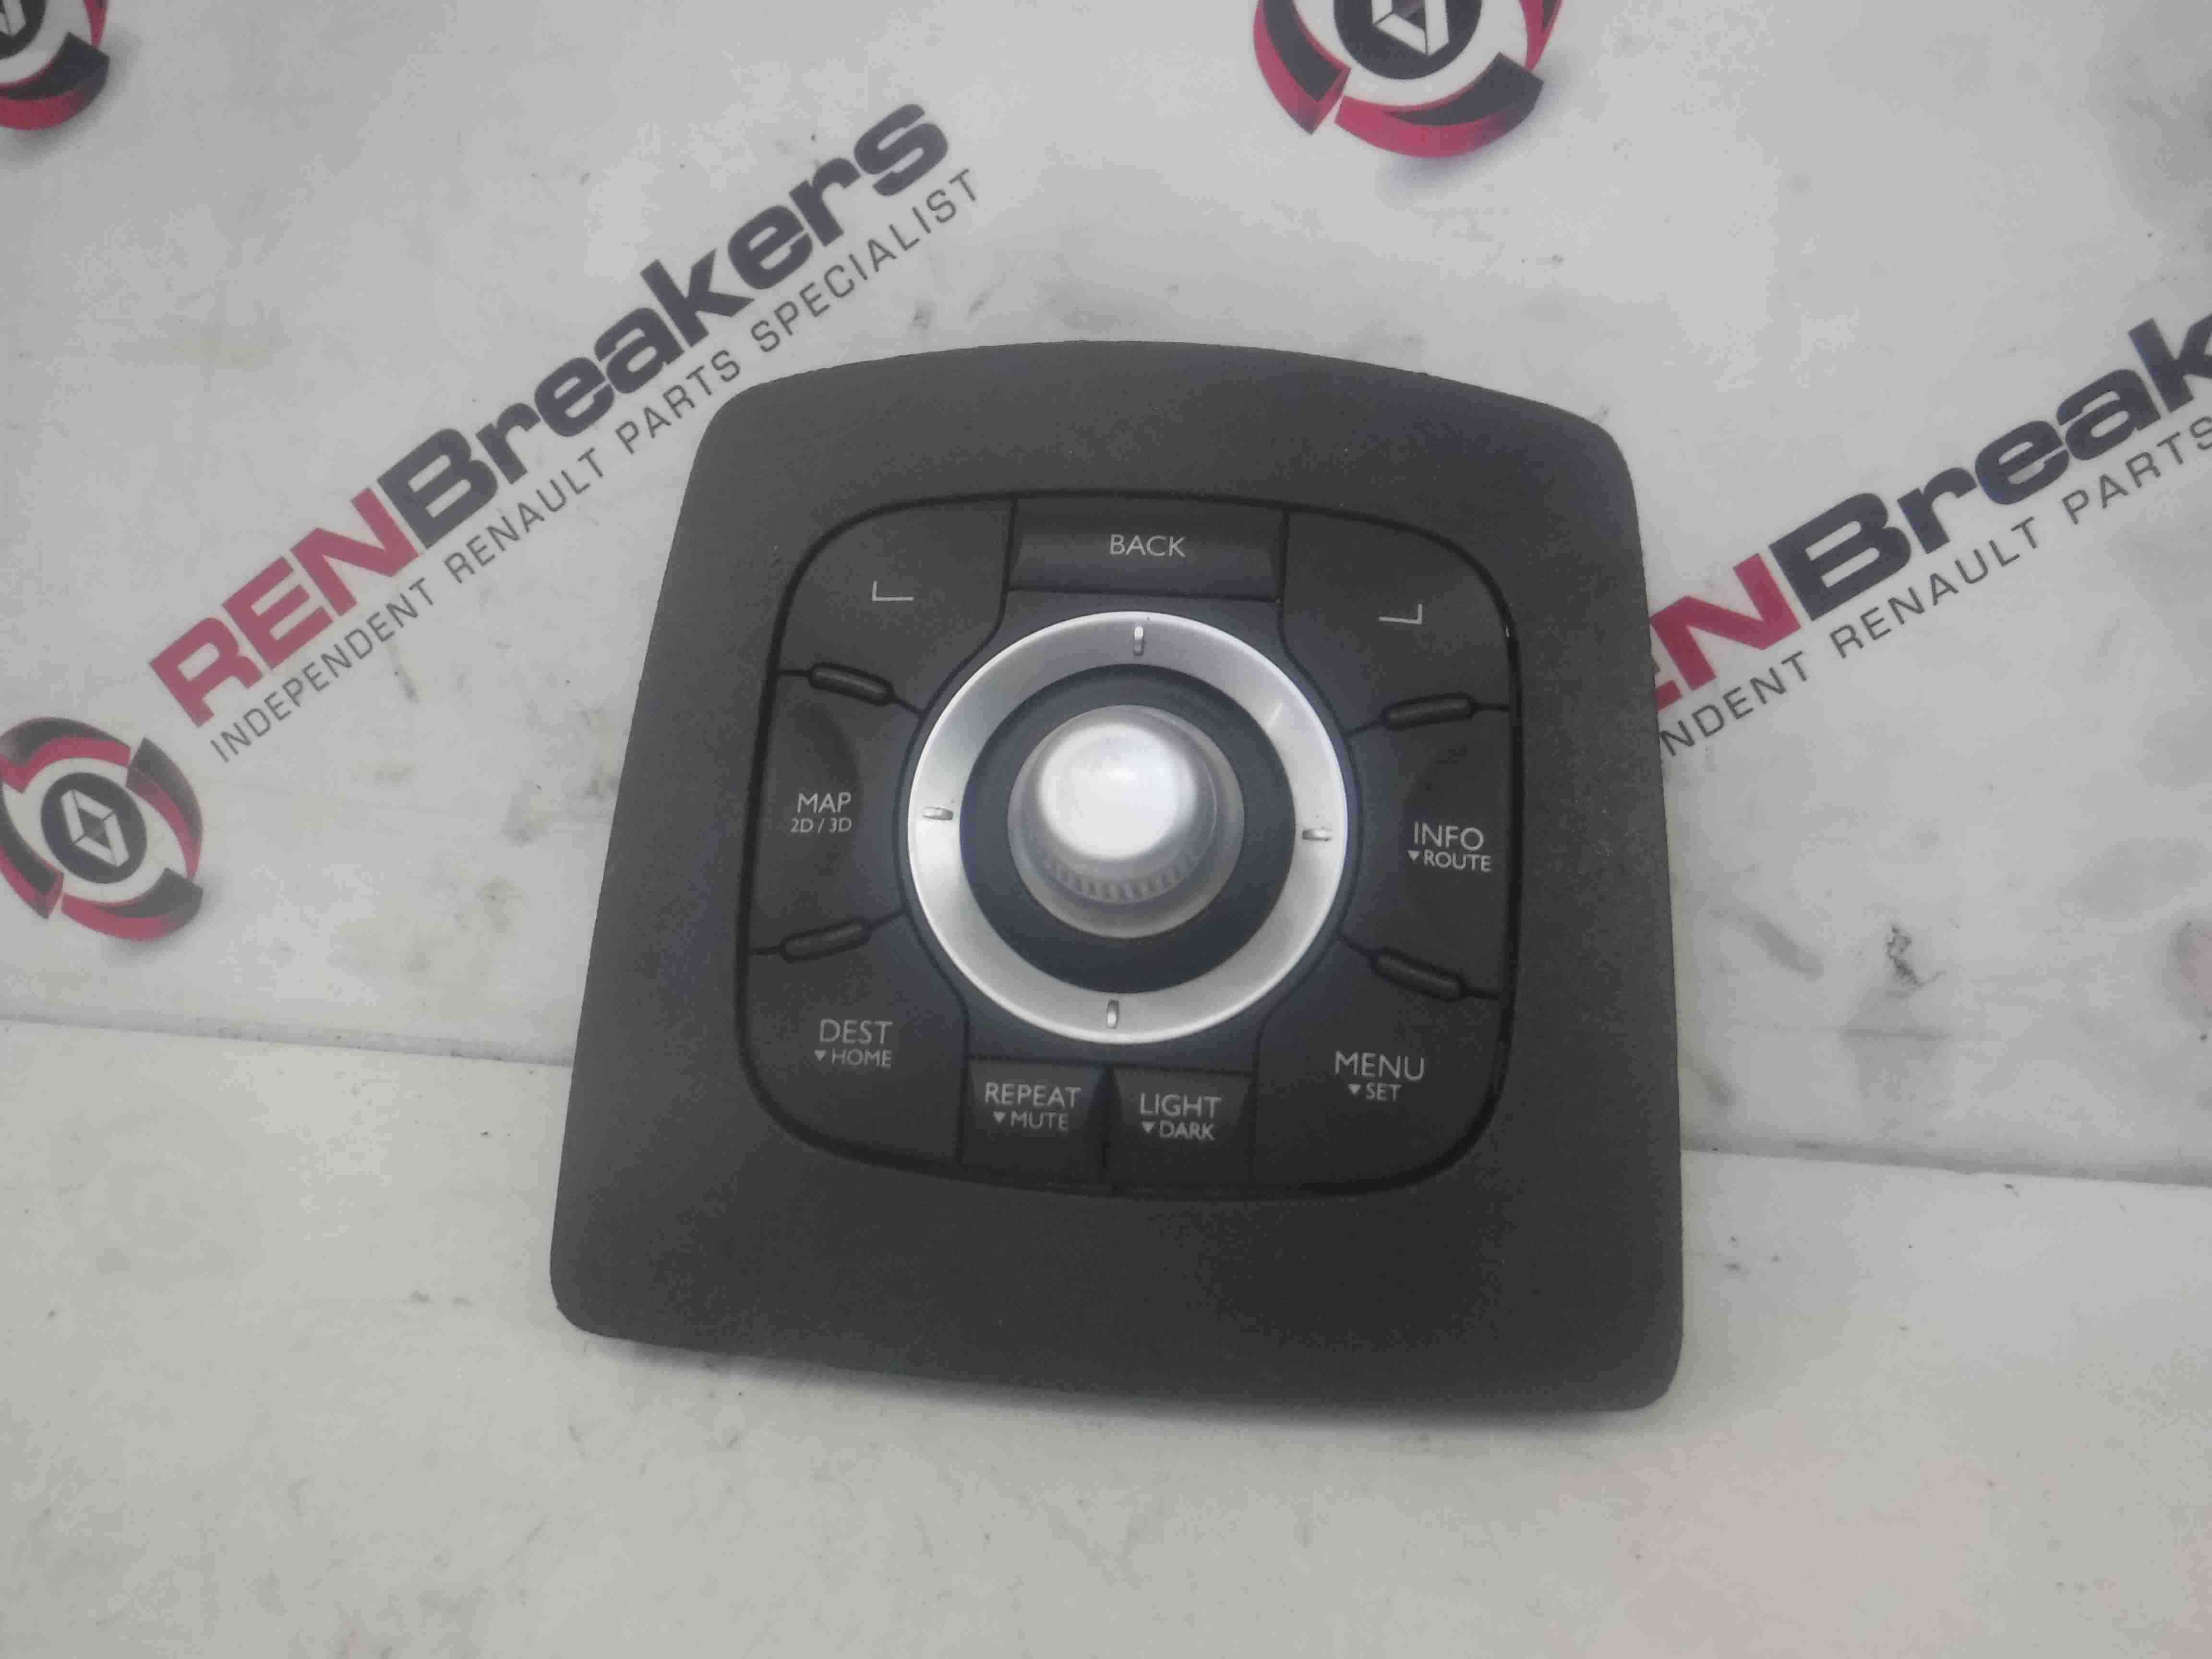 Renault Scenic MK3 2009-2016 Sat Nav Multi Media Controls Switch Unit 253B00345R